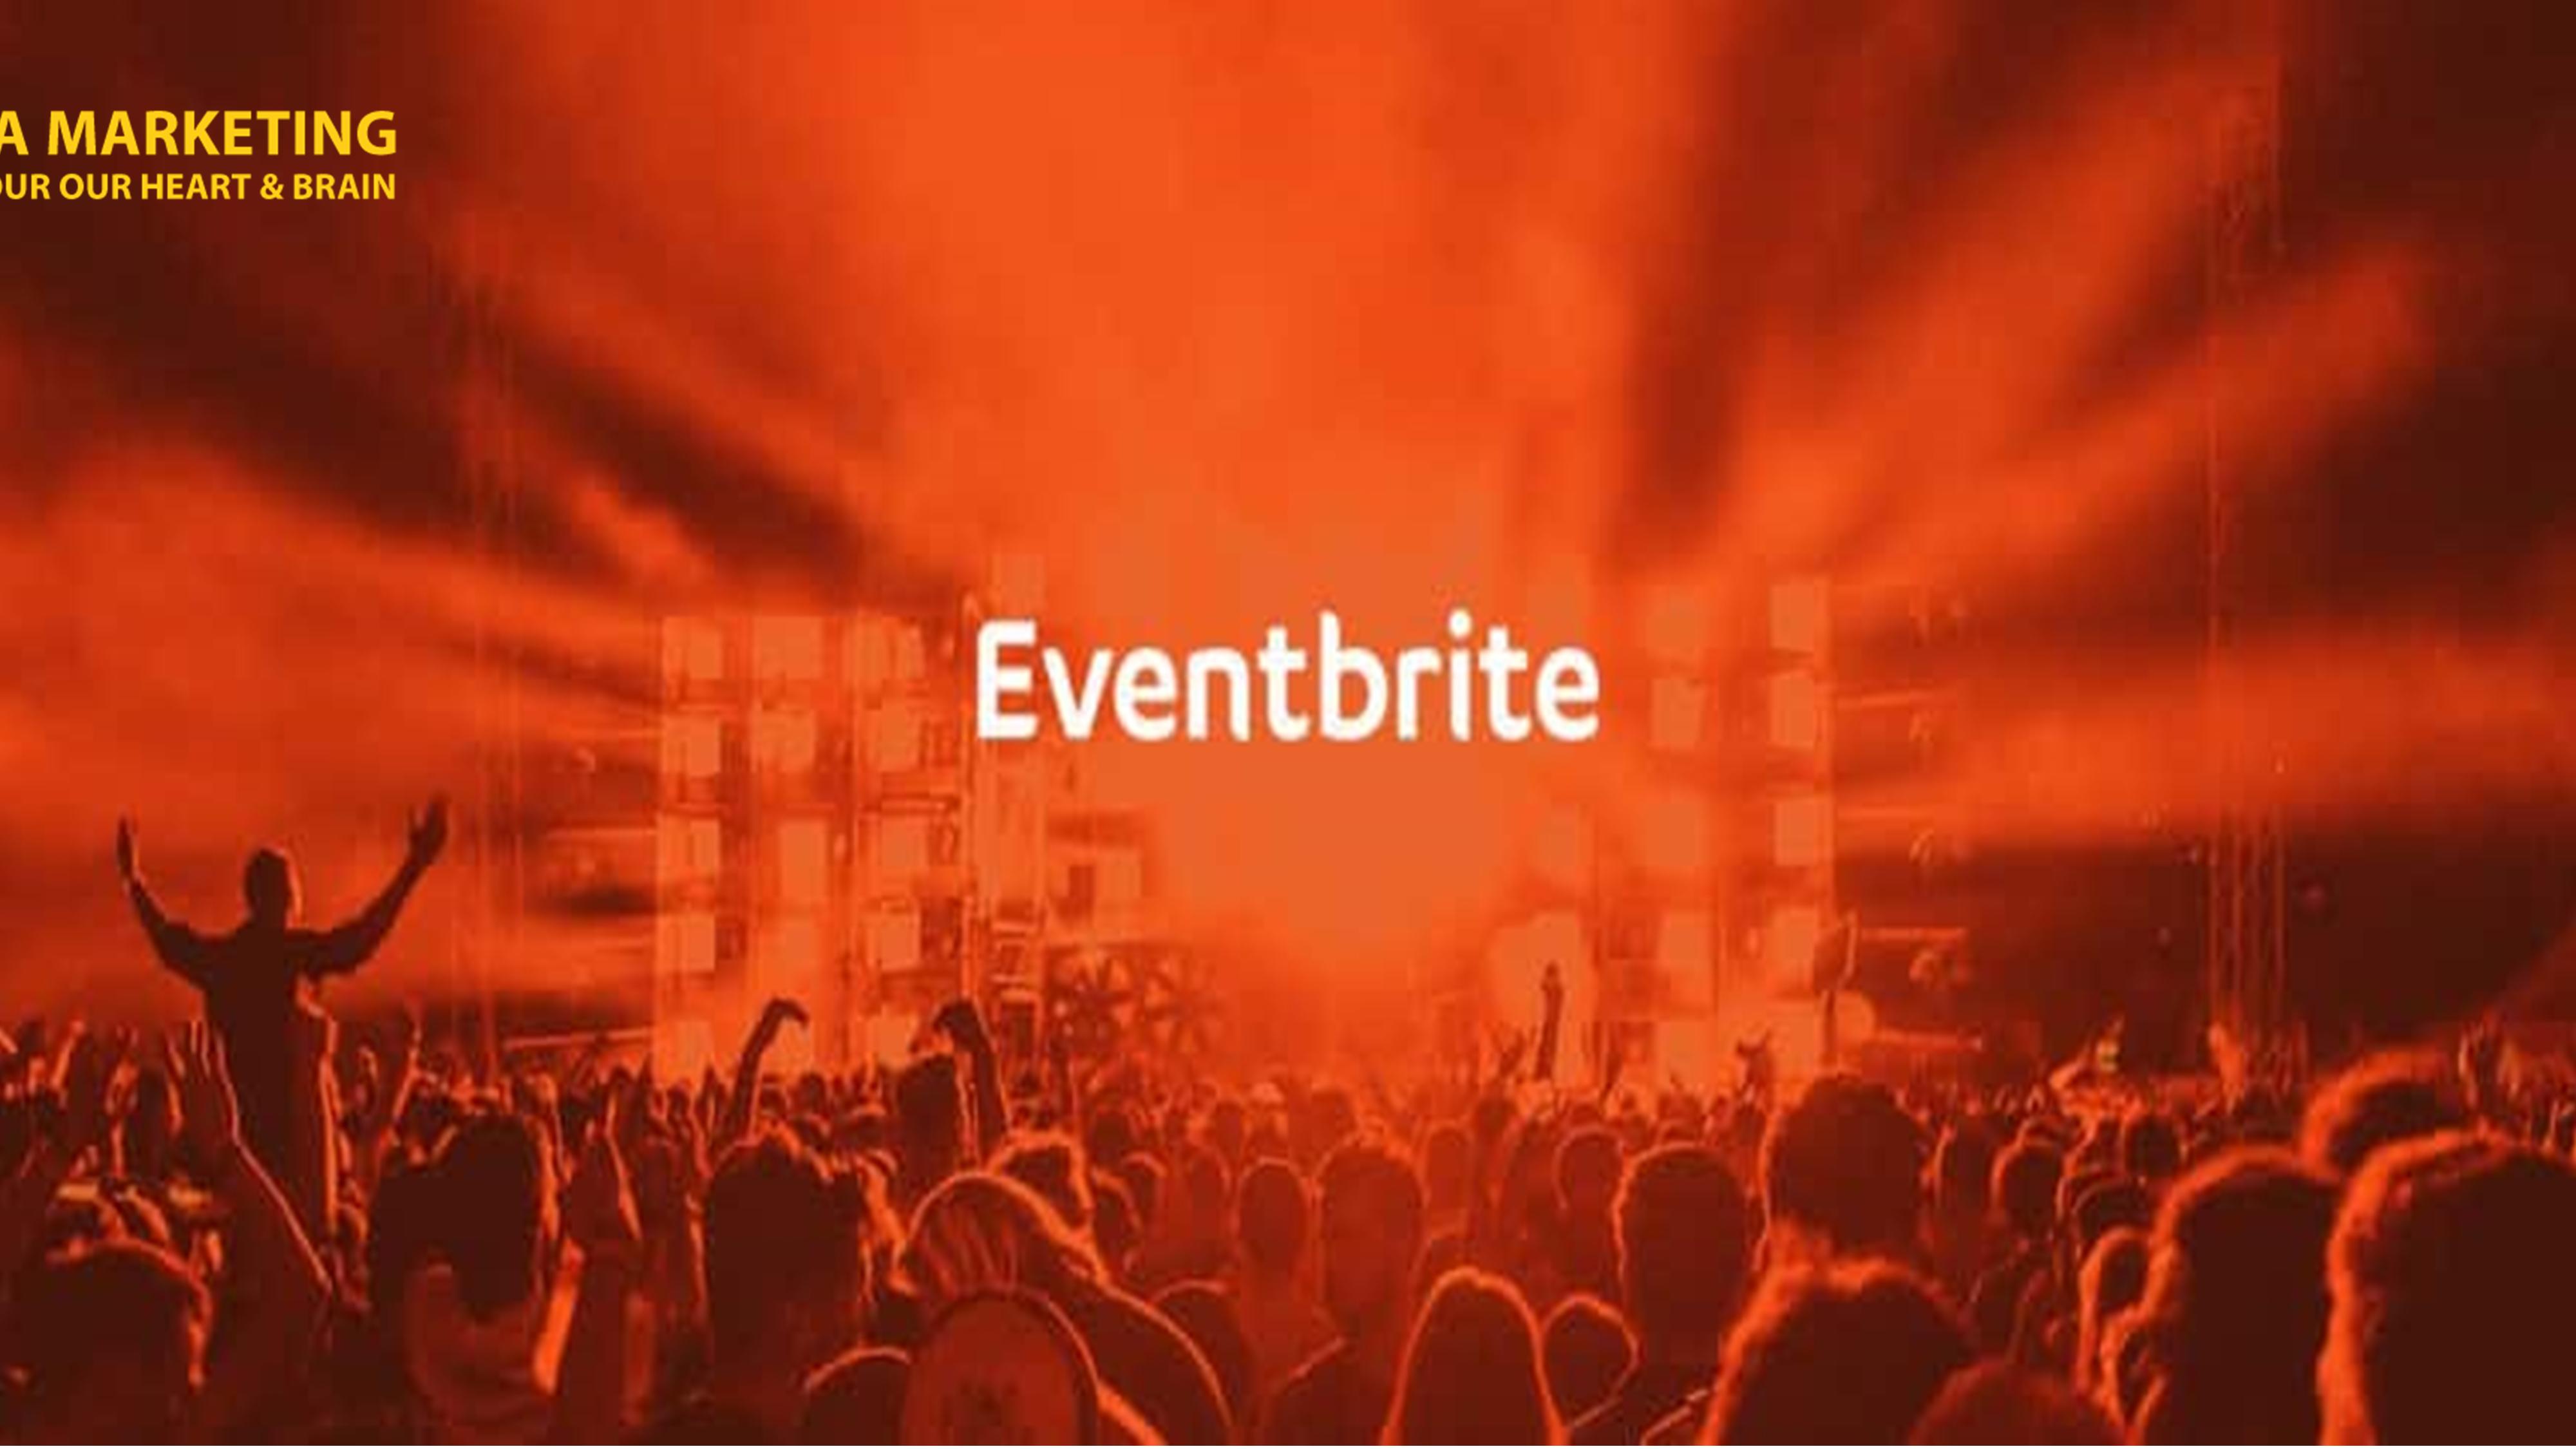 Mô hình kinh doanh Eventbrite Freemium